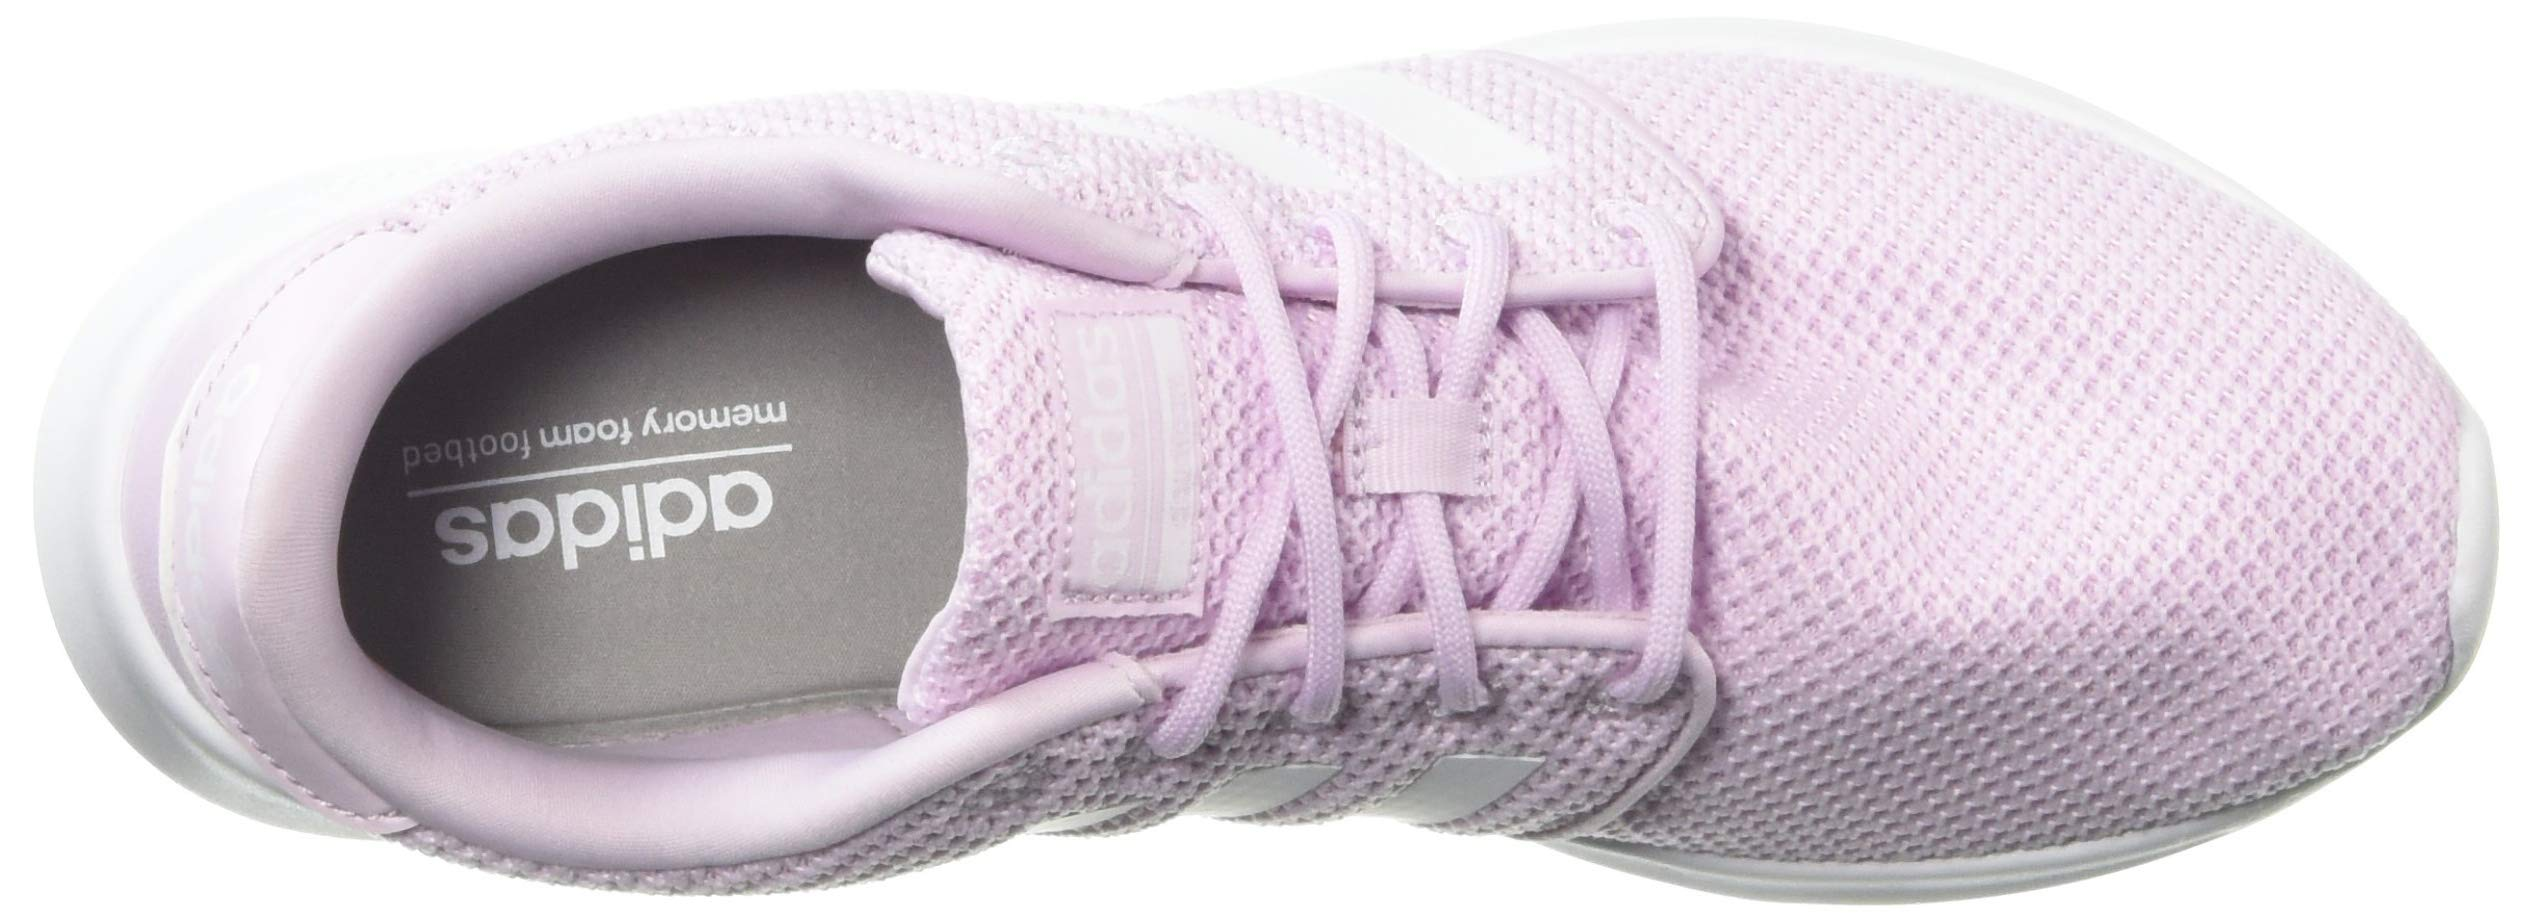 adidas Women's Cloudfoam QT Racer, White/aero Pink, 5.5 M US by adidas (Image #7)